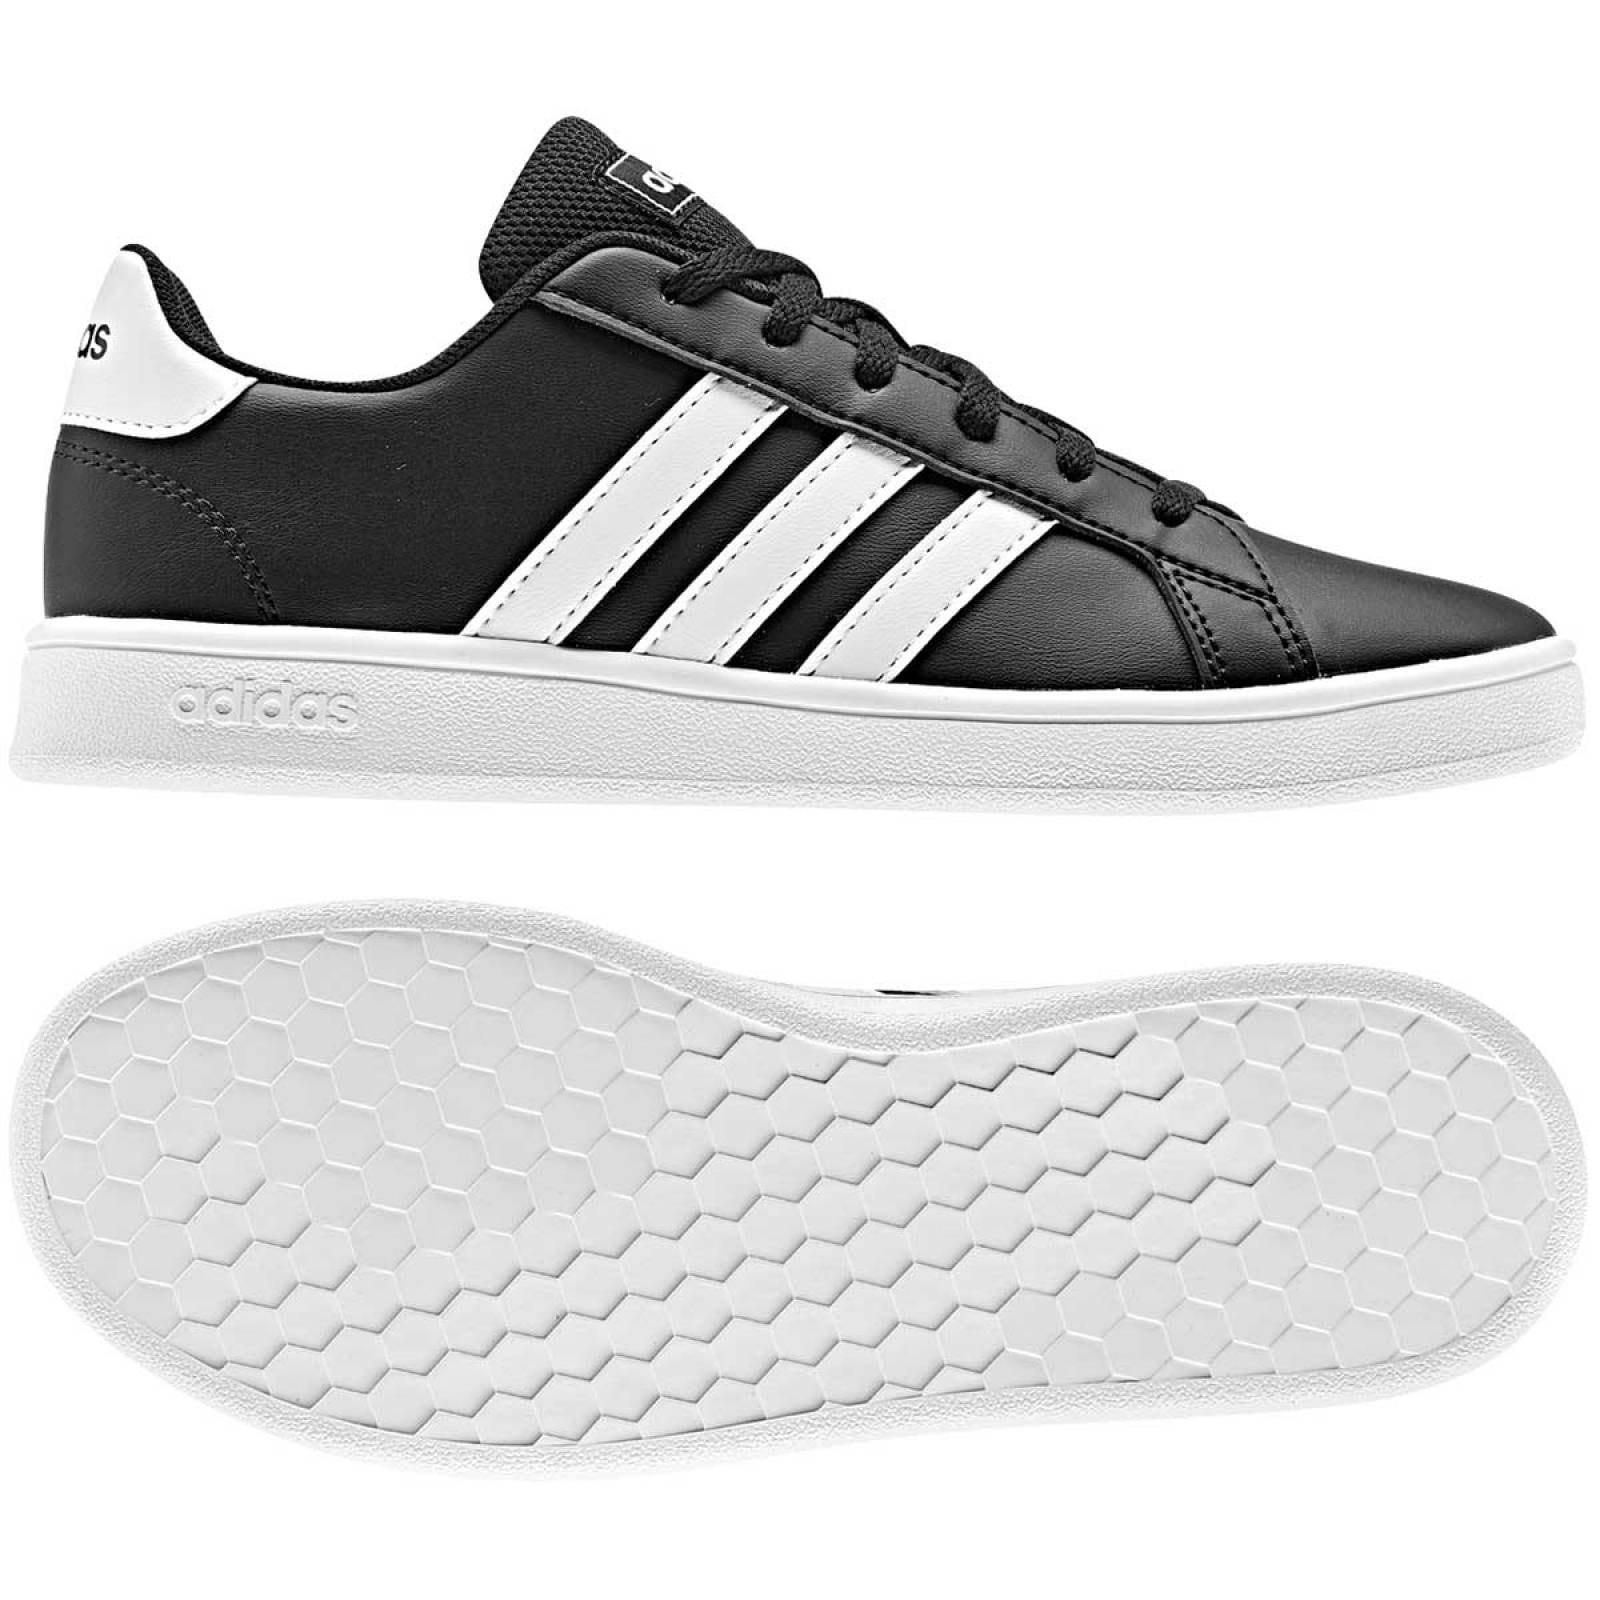 Adidas Tenis Joven Negro blanco